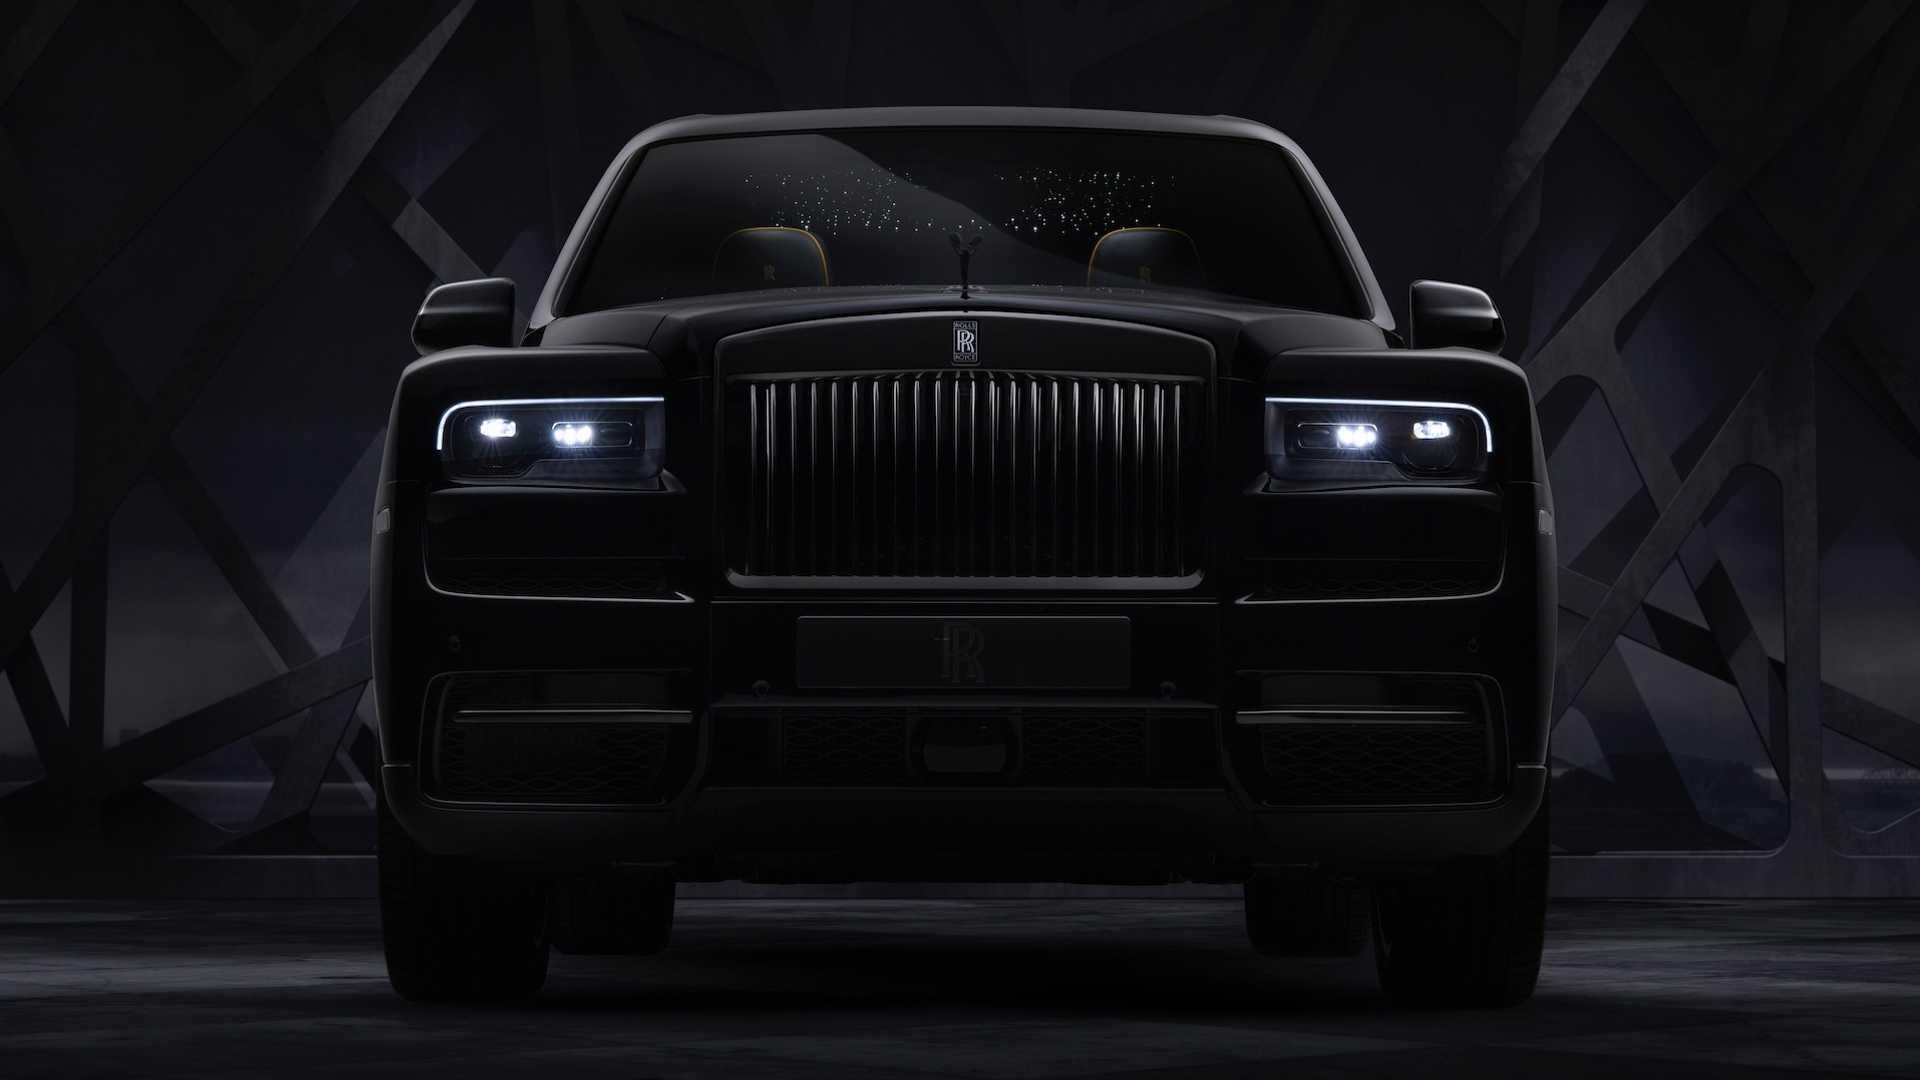 Кроссовер Rolls-Royce стал мощнее и богаче 1